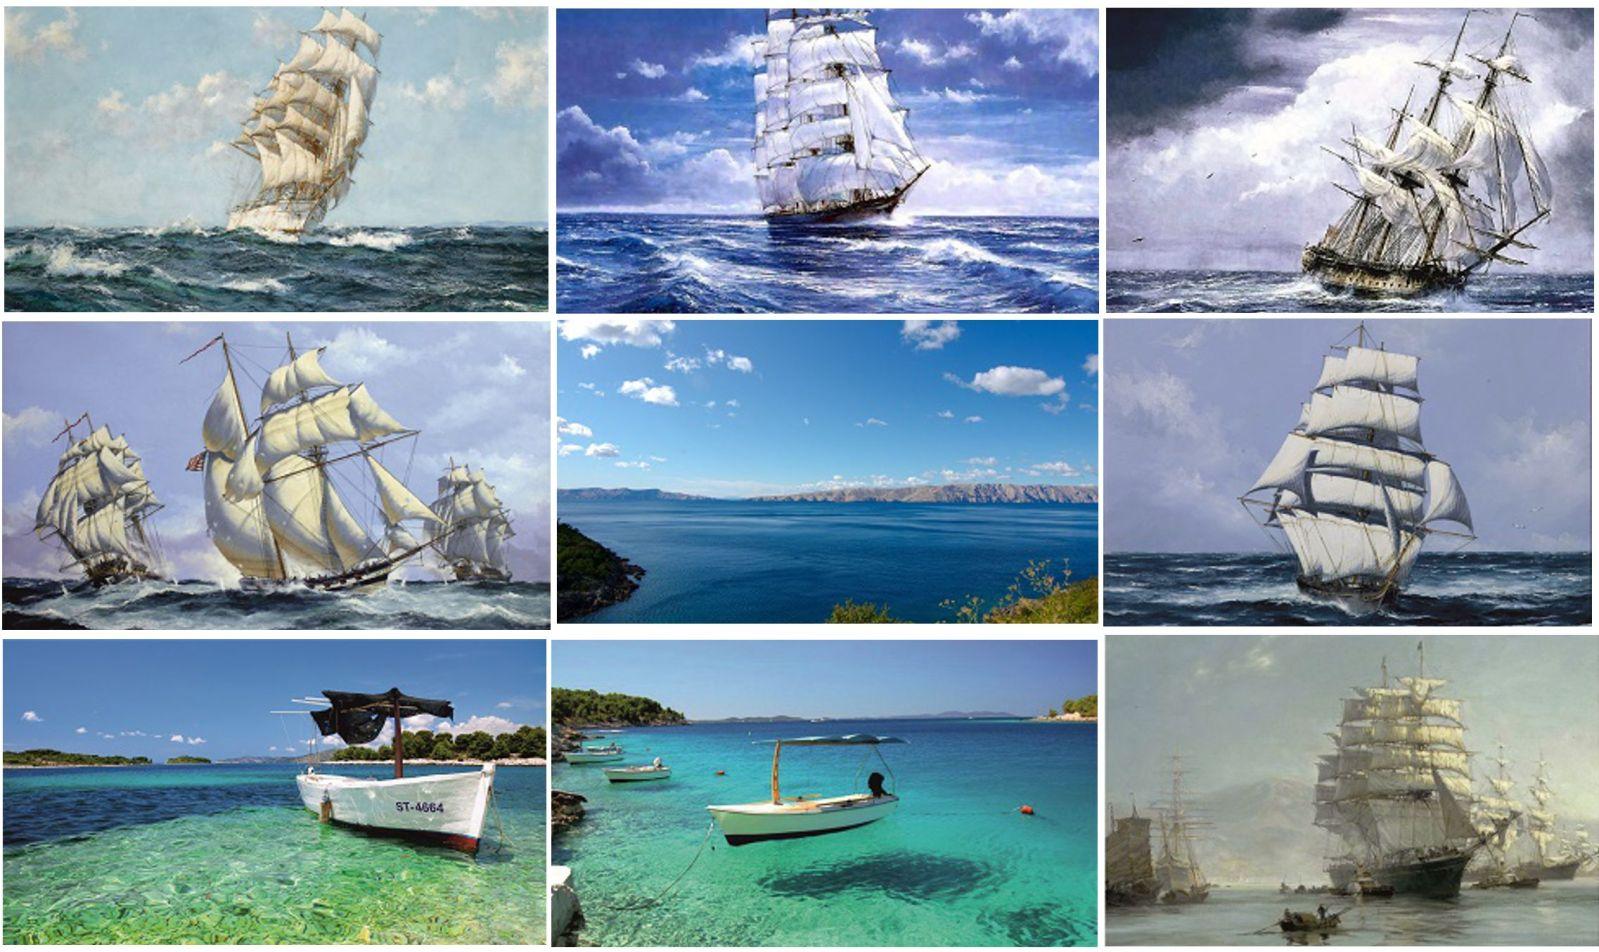 Background slike sa plovećim motivima hrvatskom obalom T4xywy